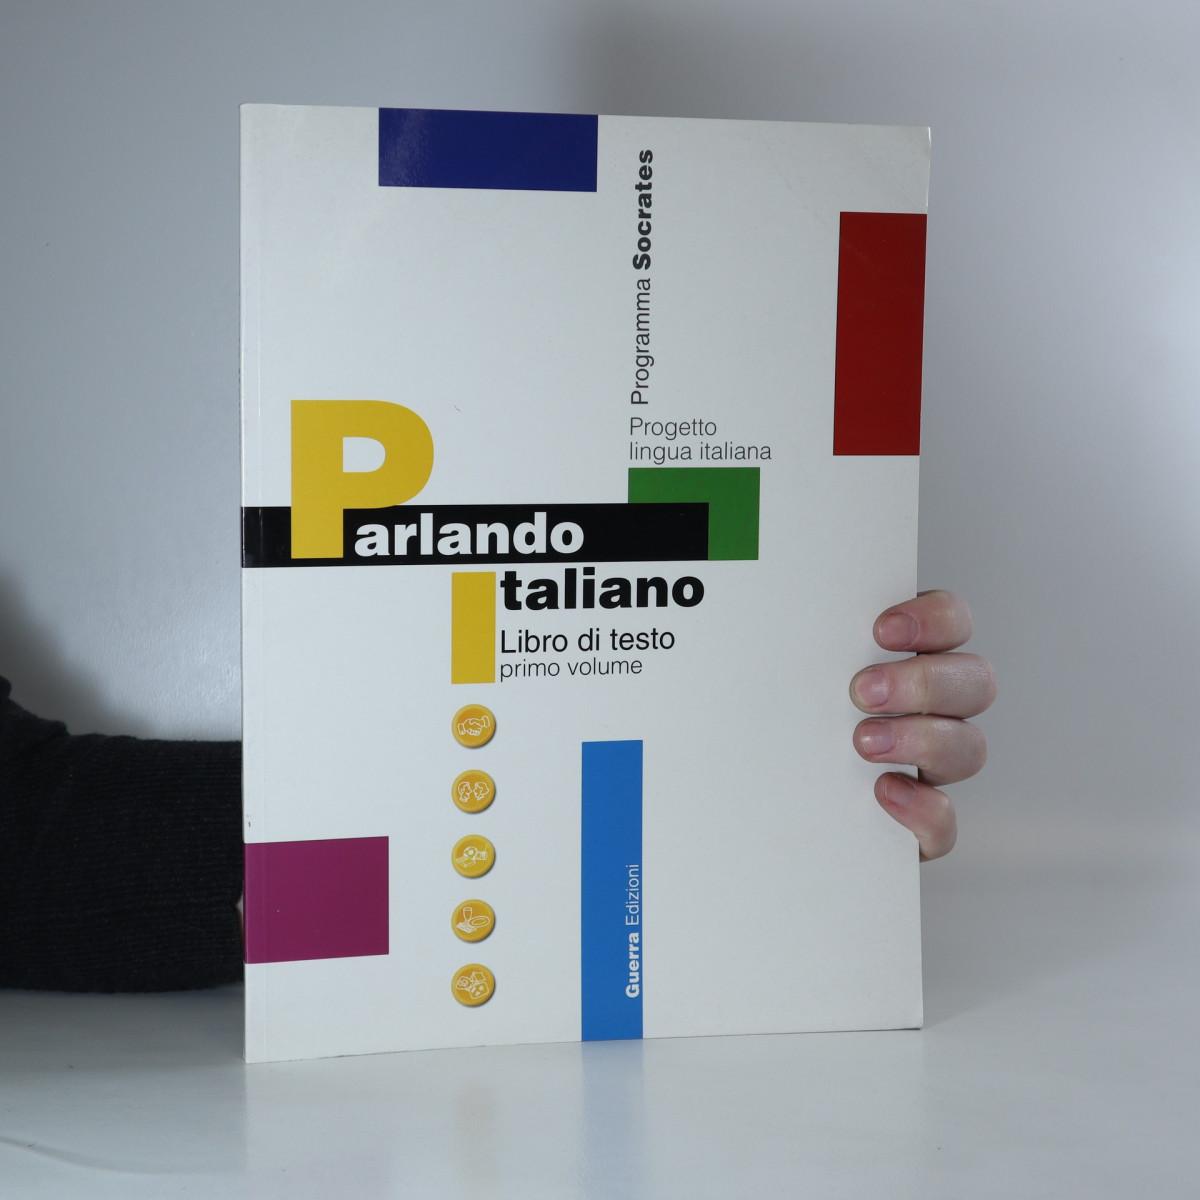 antikvární kniha Parlando italiano : libro di testo. Primo volume, 1999